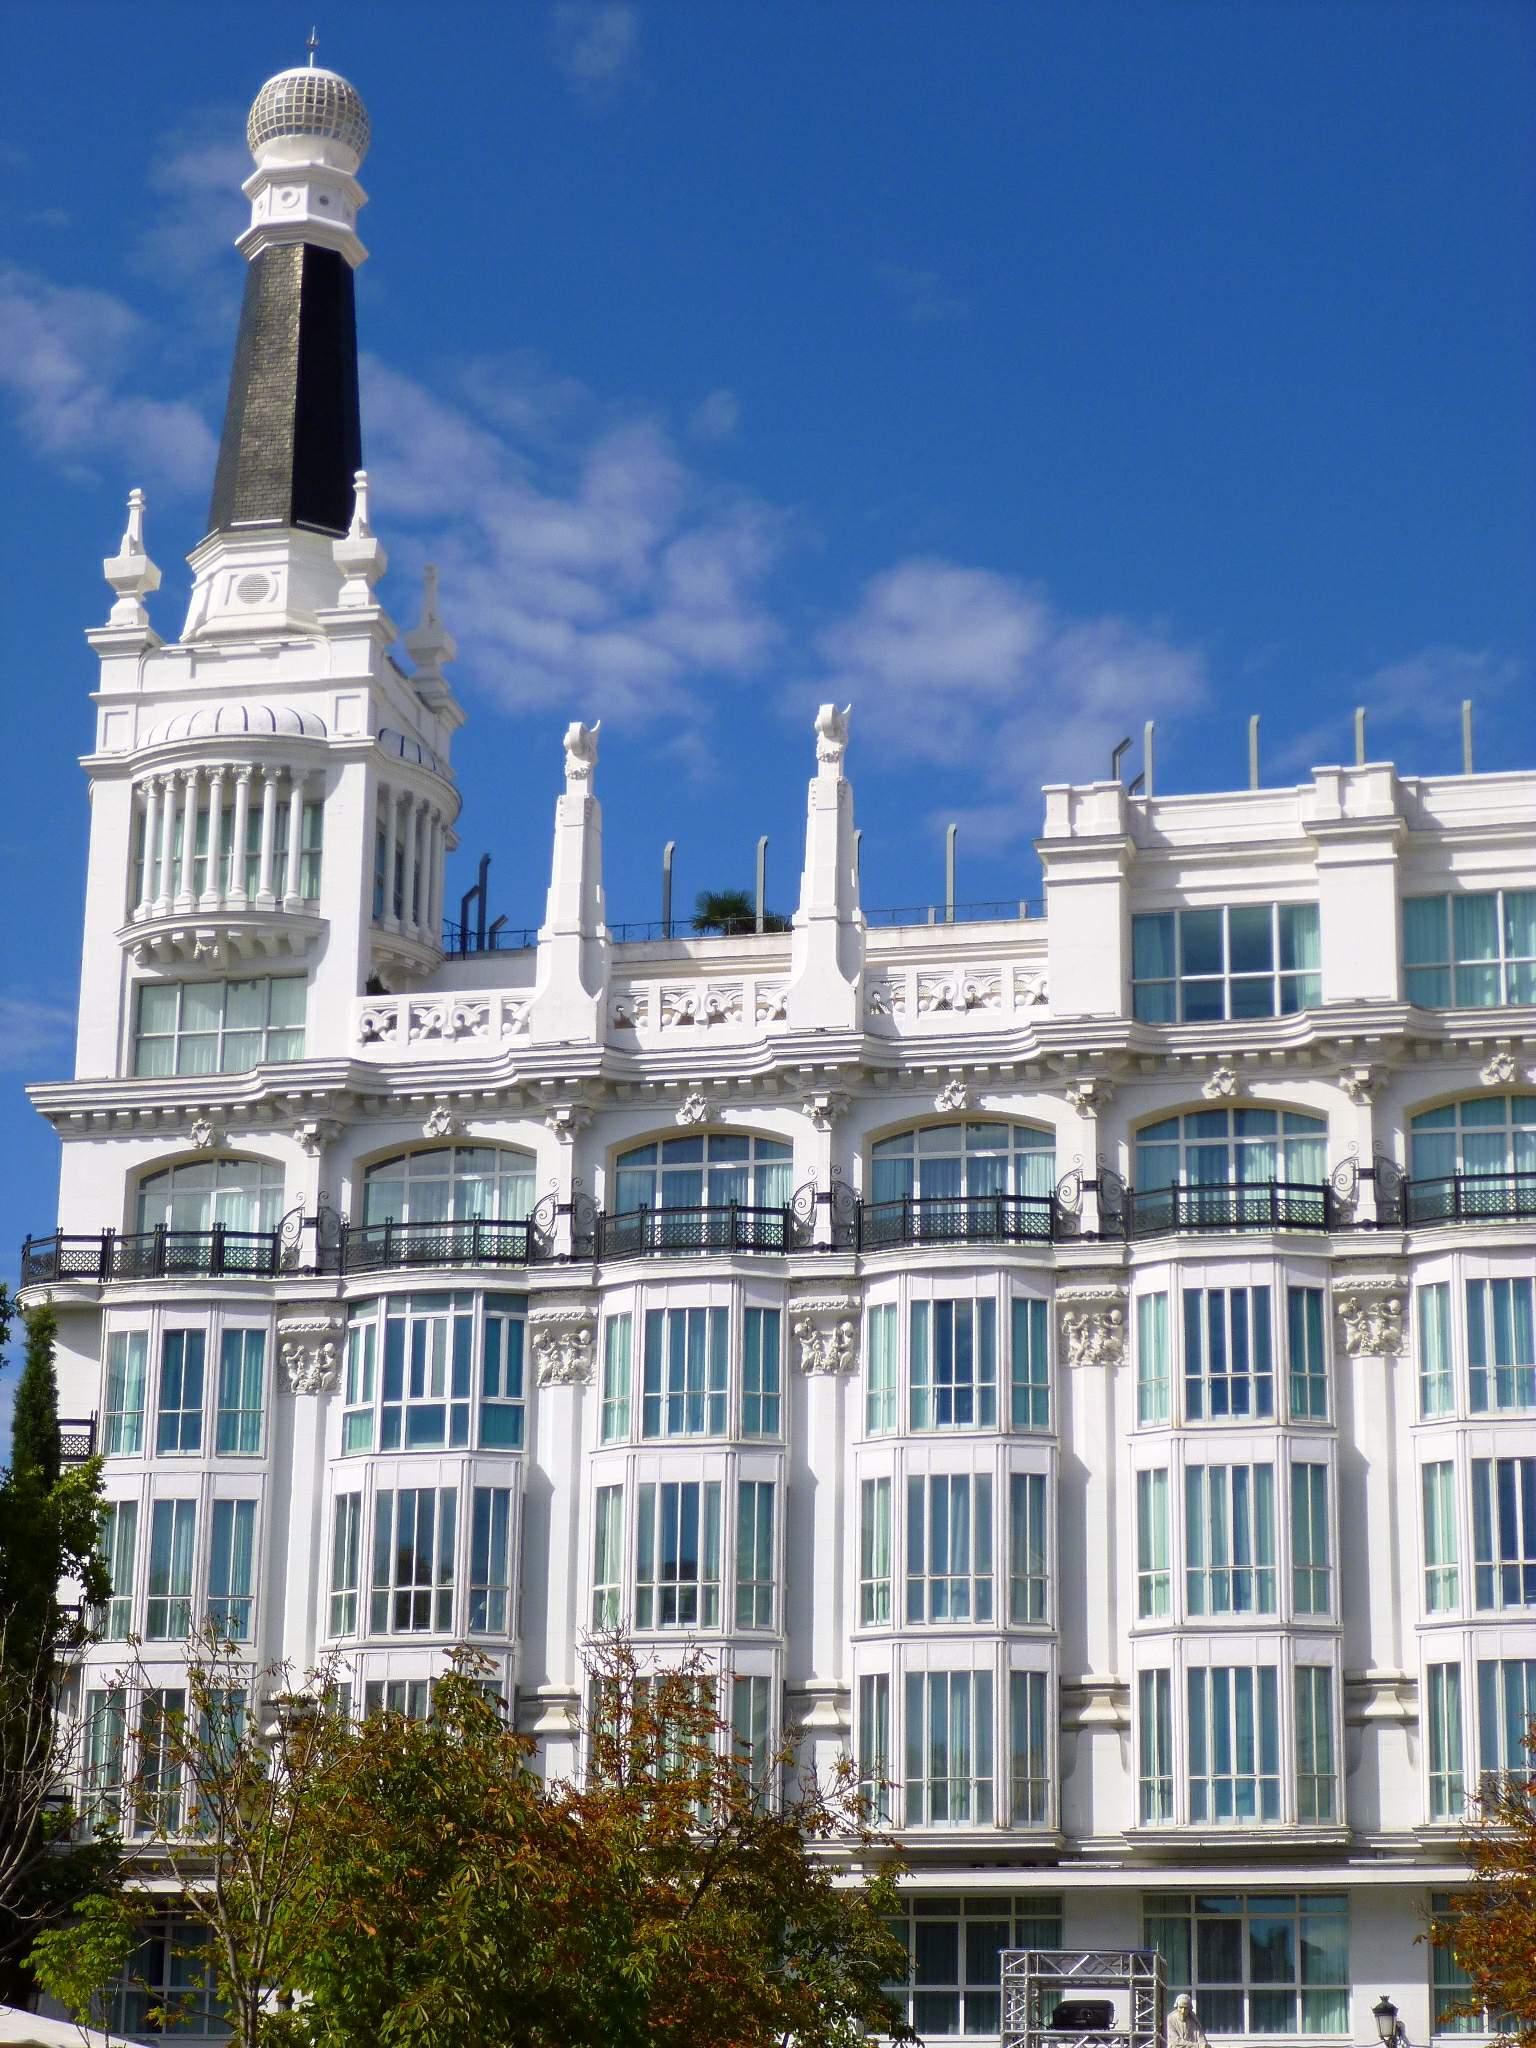 Hotel Victoria Santa Valburga